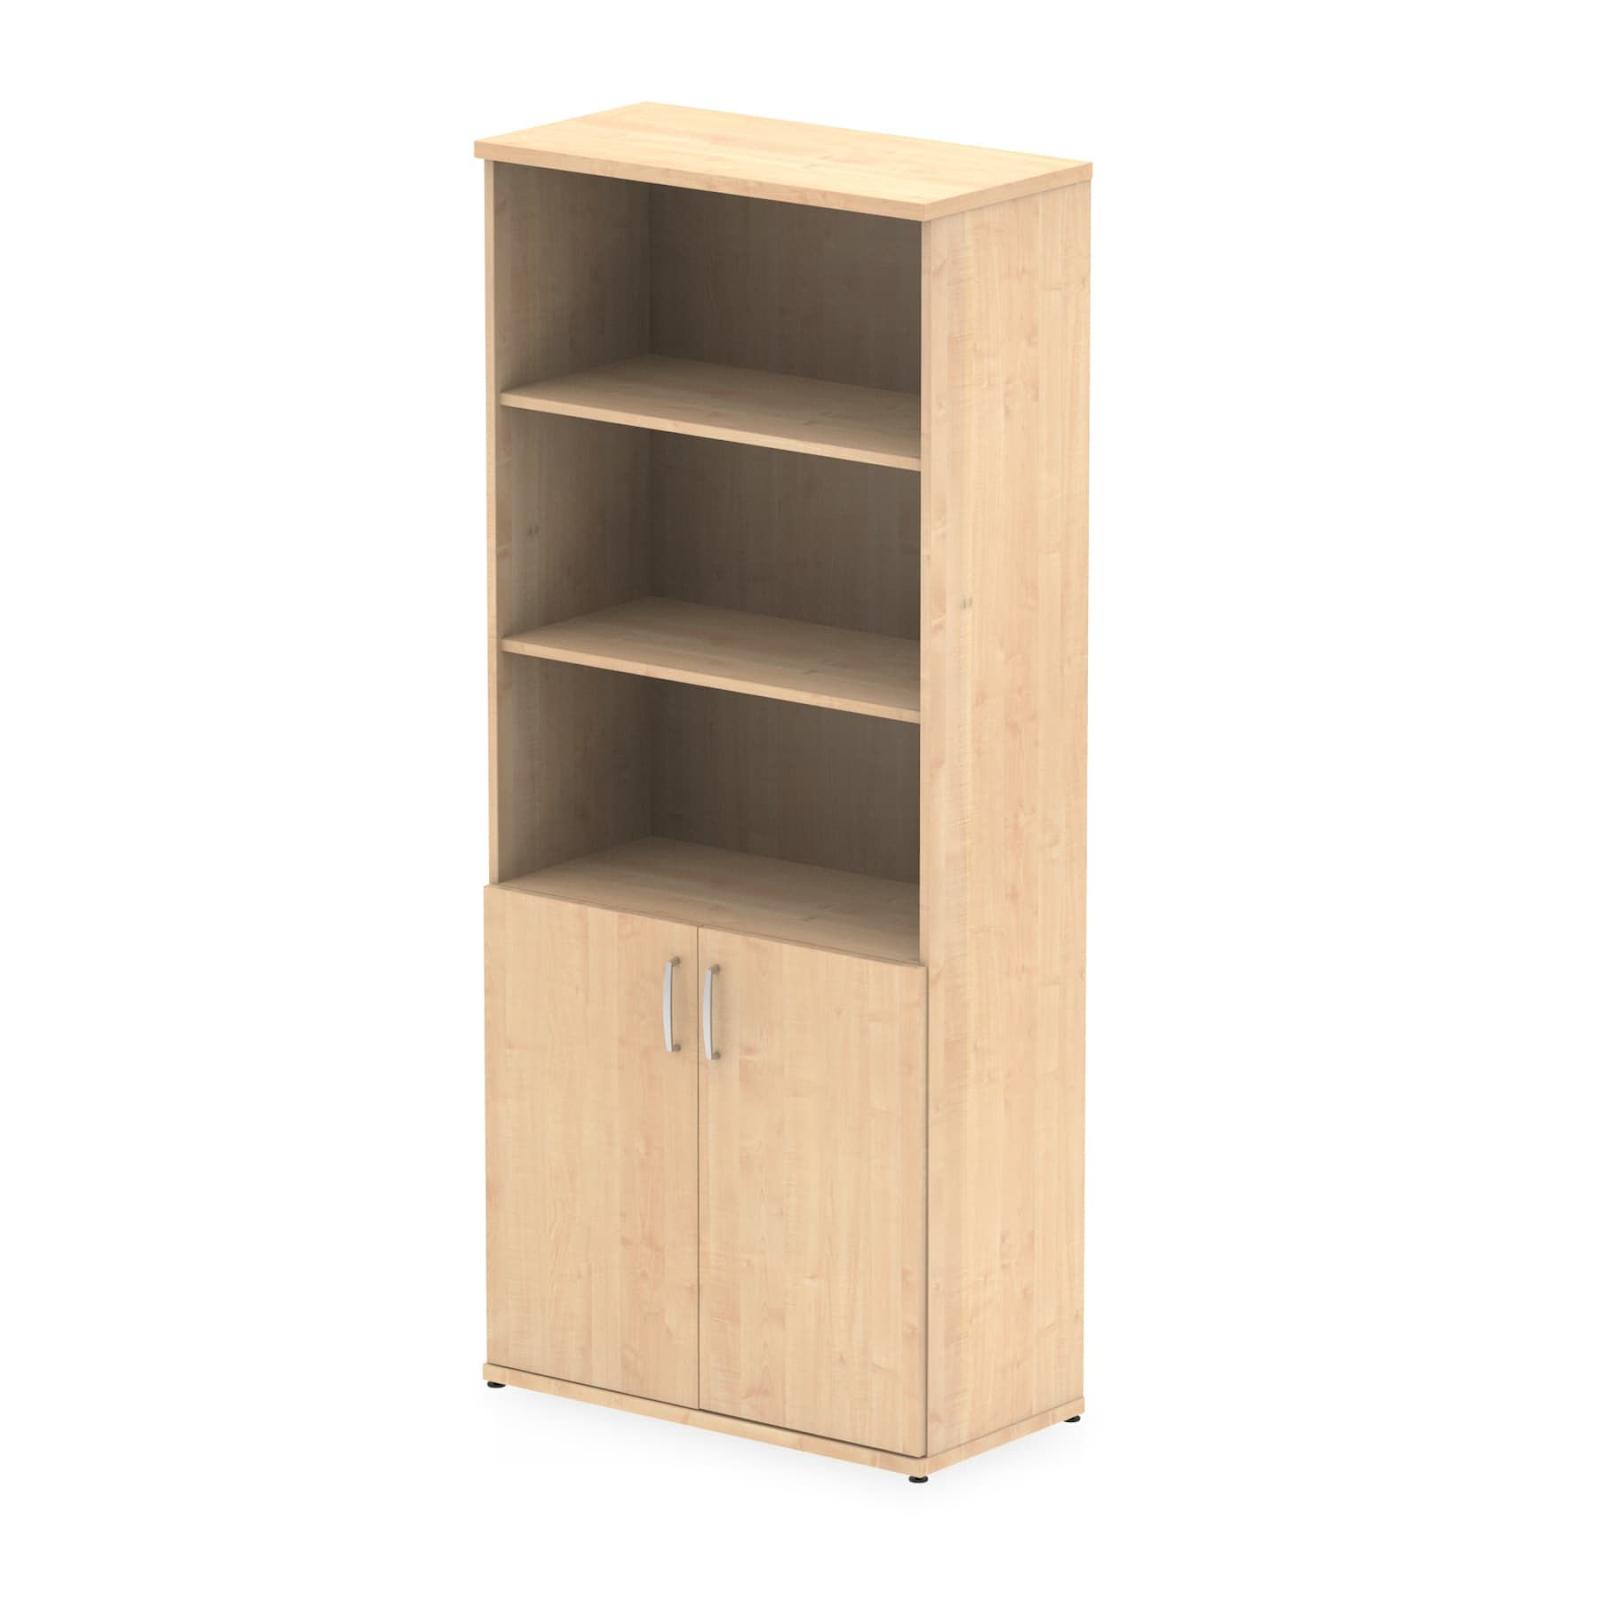 Impulse 2000 Open Shelves Storage Cupboard, Maple finish